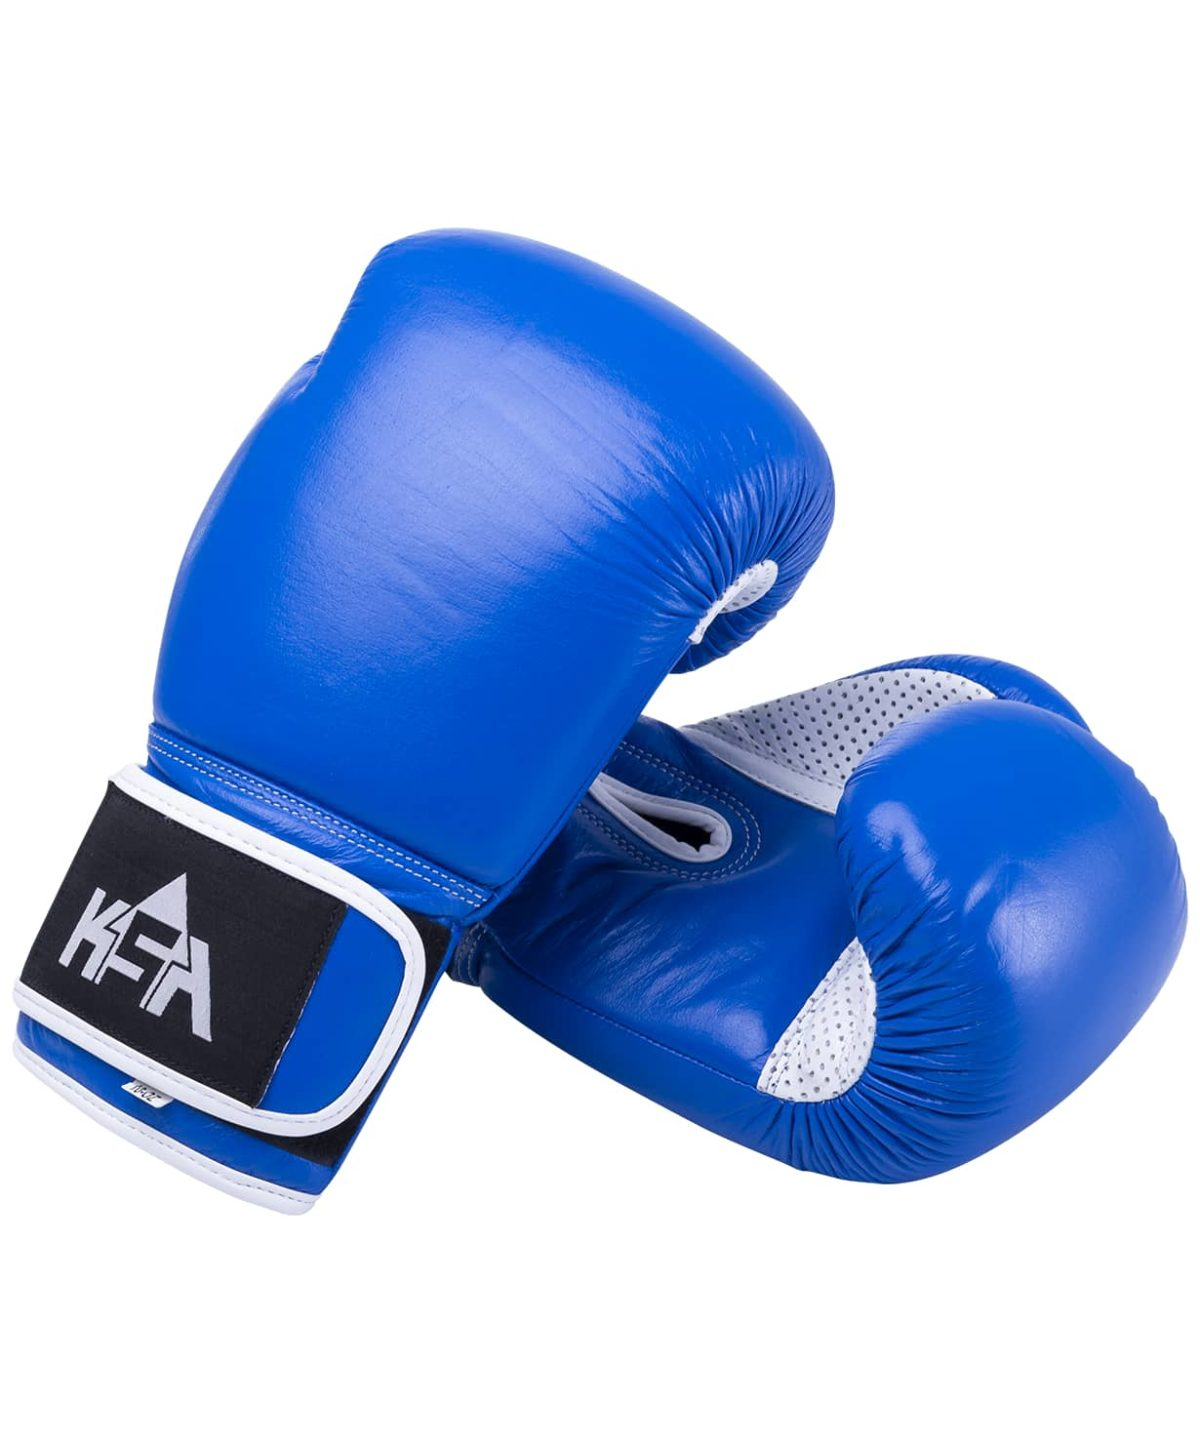 KSA Wolf Blue Перчатки боксерские, 10 oz, кожа 17830 - 1